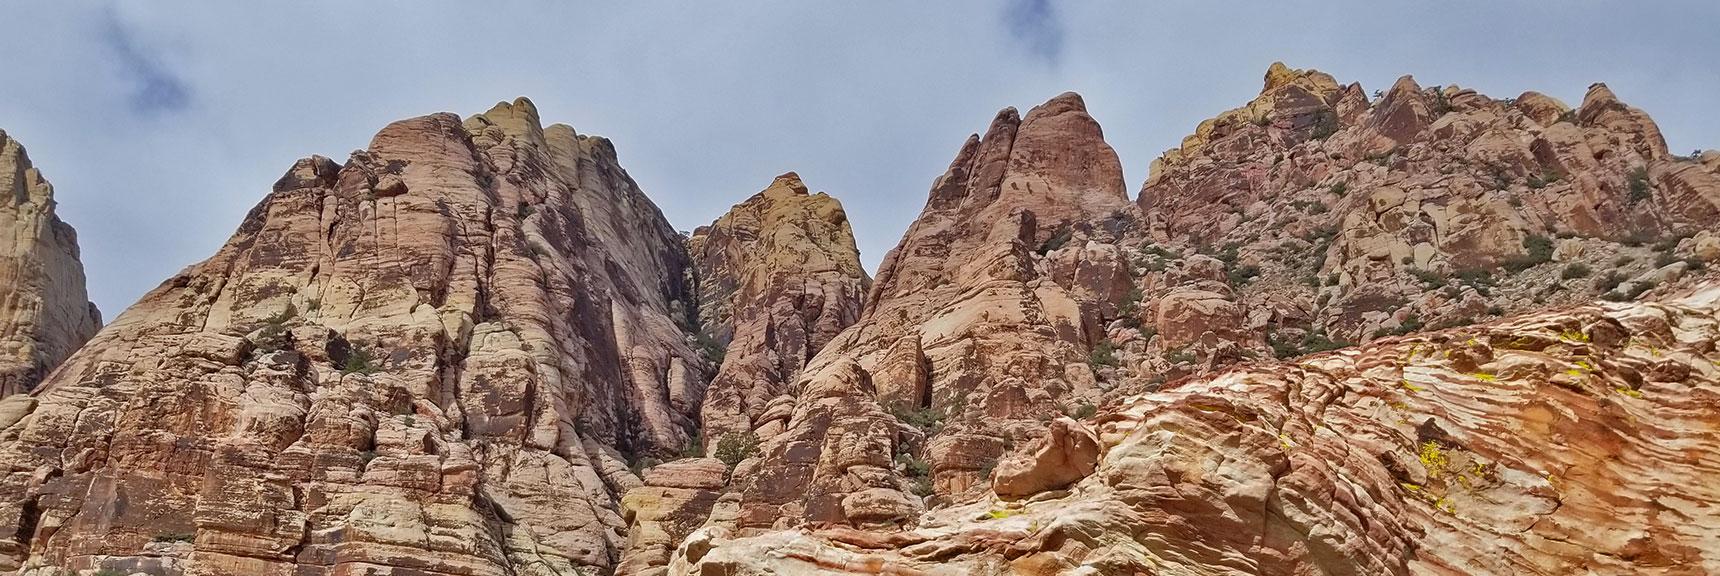 Up Juniper Peak, Rainbow Mountain Wilderness, Nevada